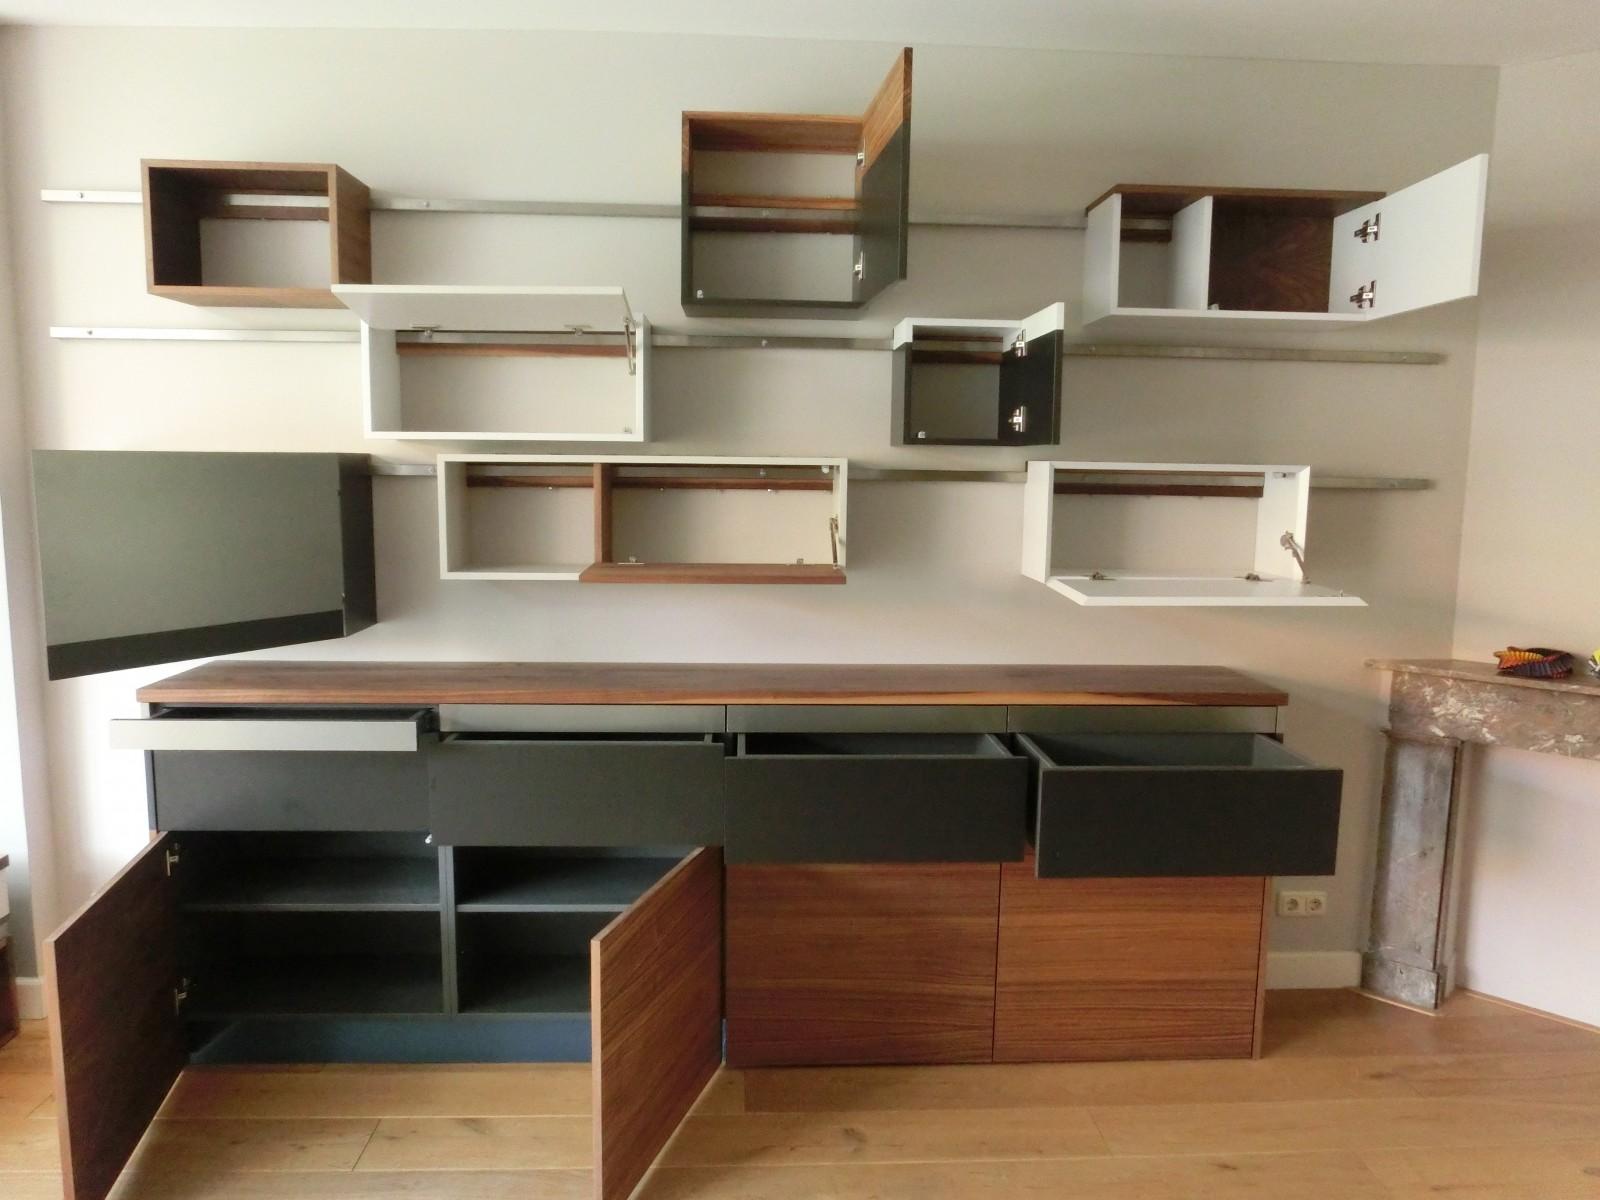 custom made cupboards in Voorburg - design and fabrication by Deuvel Design